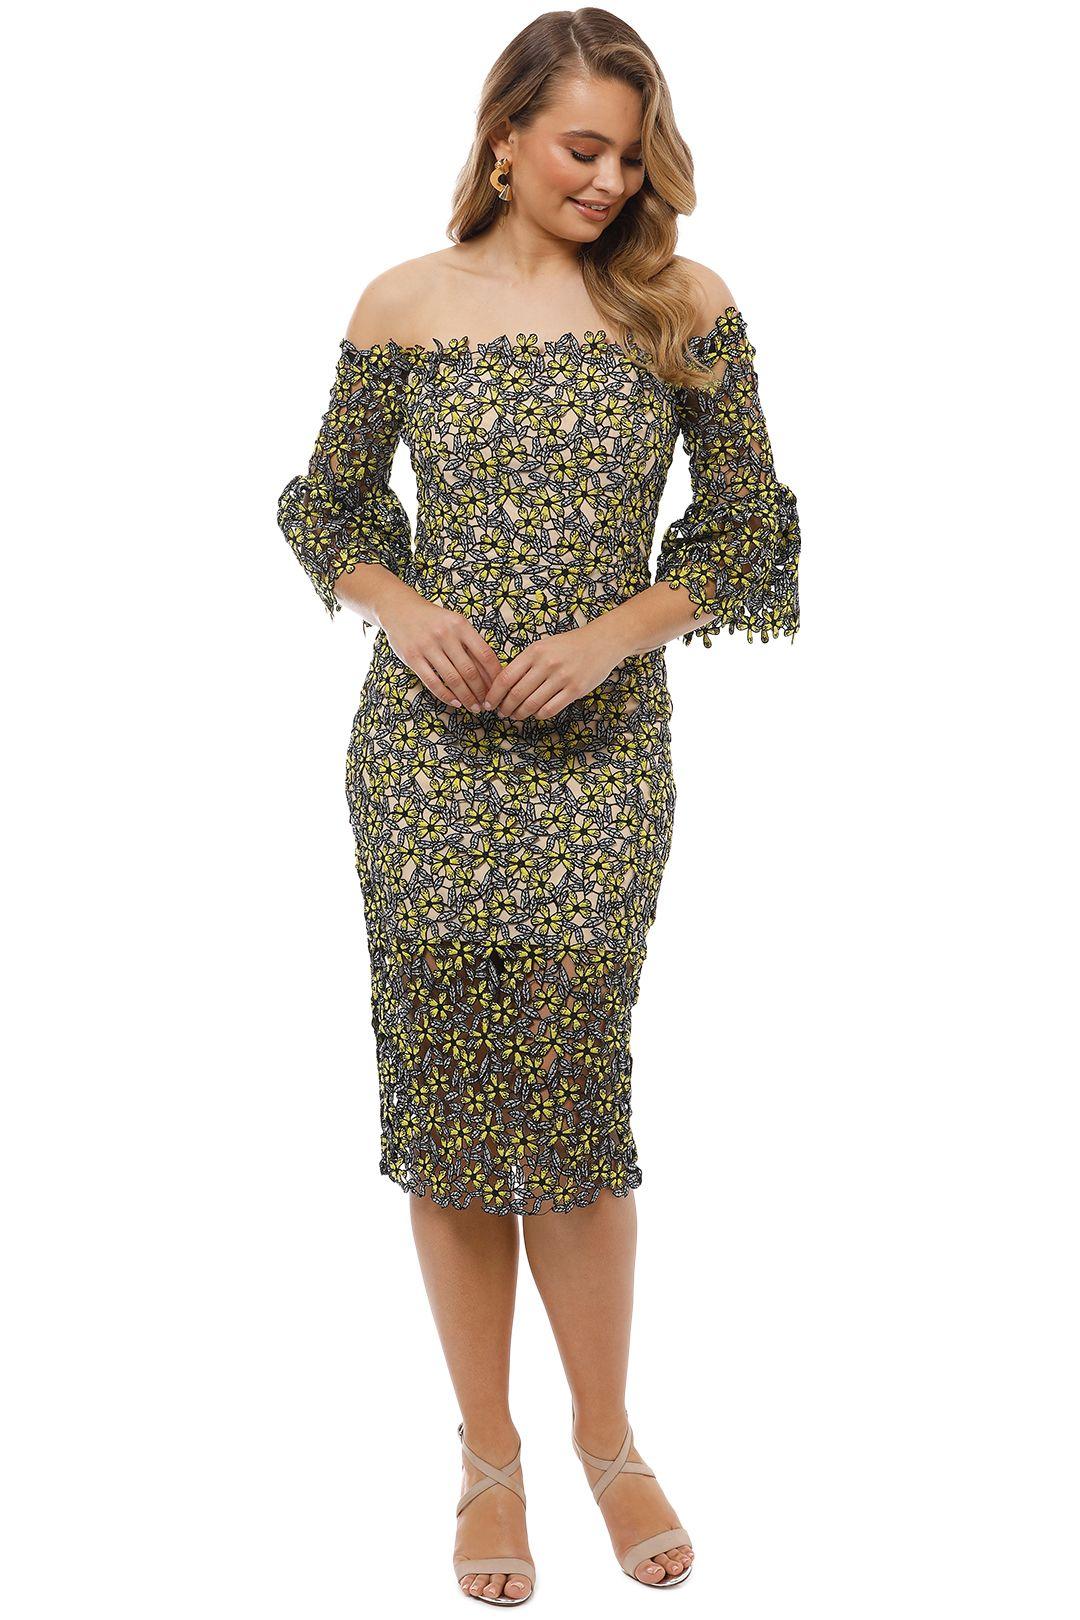 Elliatt - Eden Dress - Multi - Front